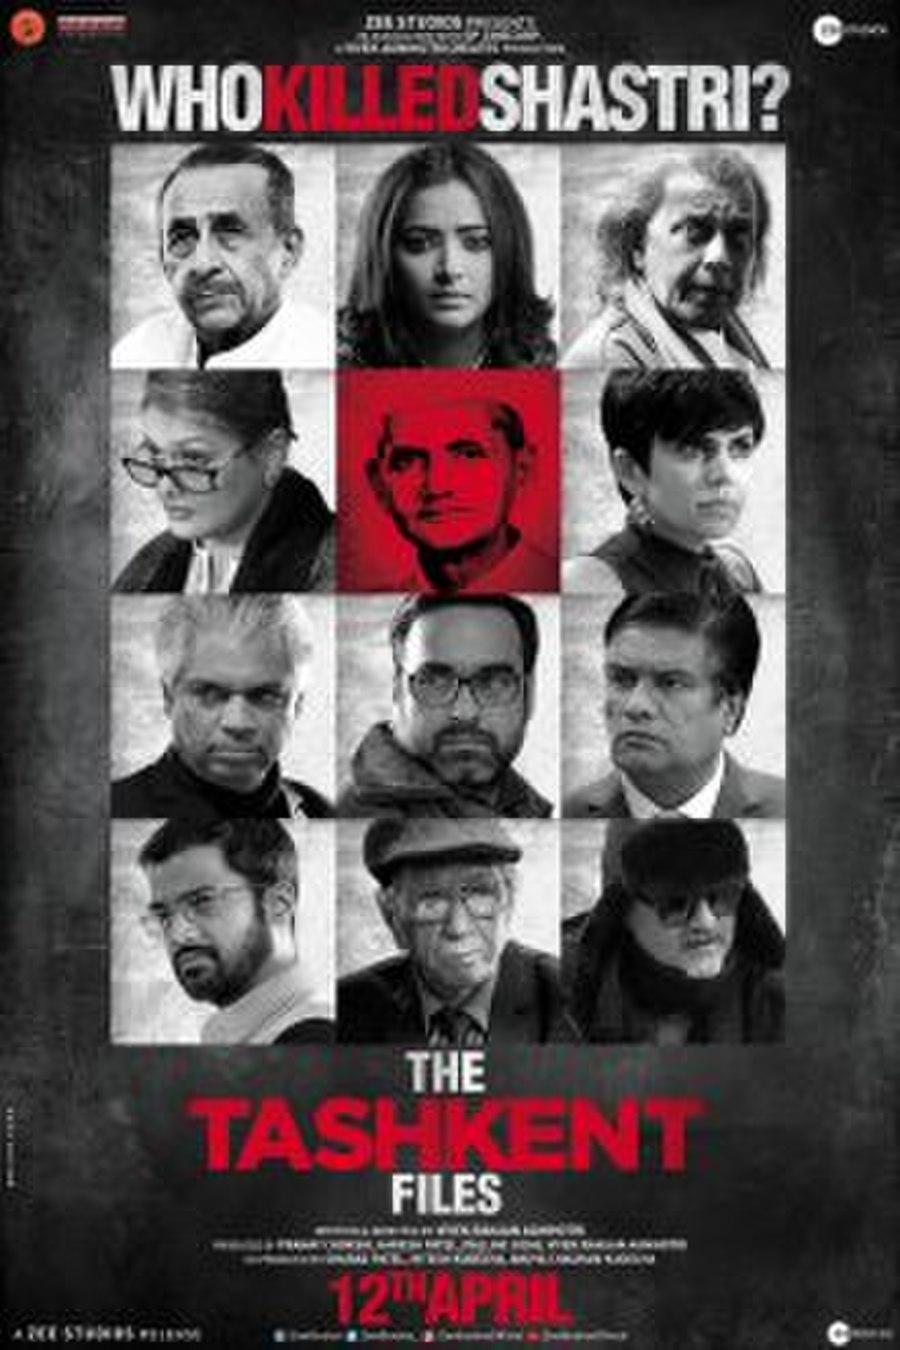 The Tashkent Files